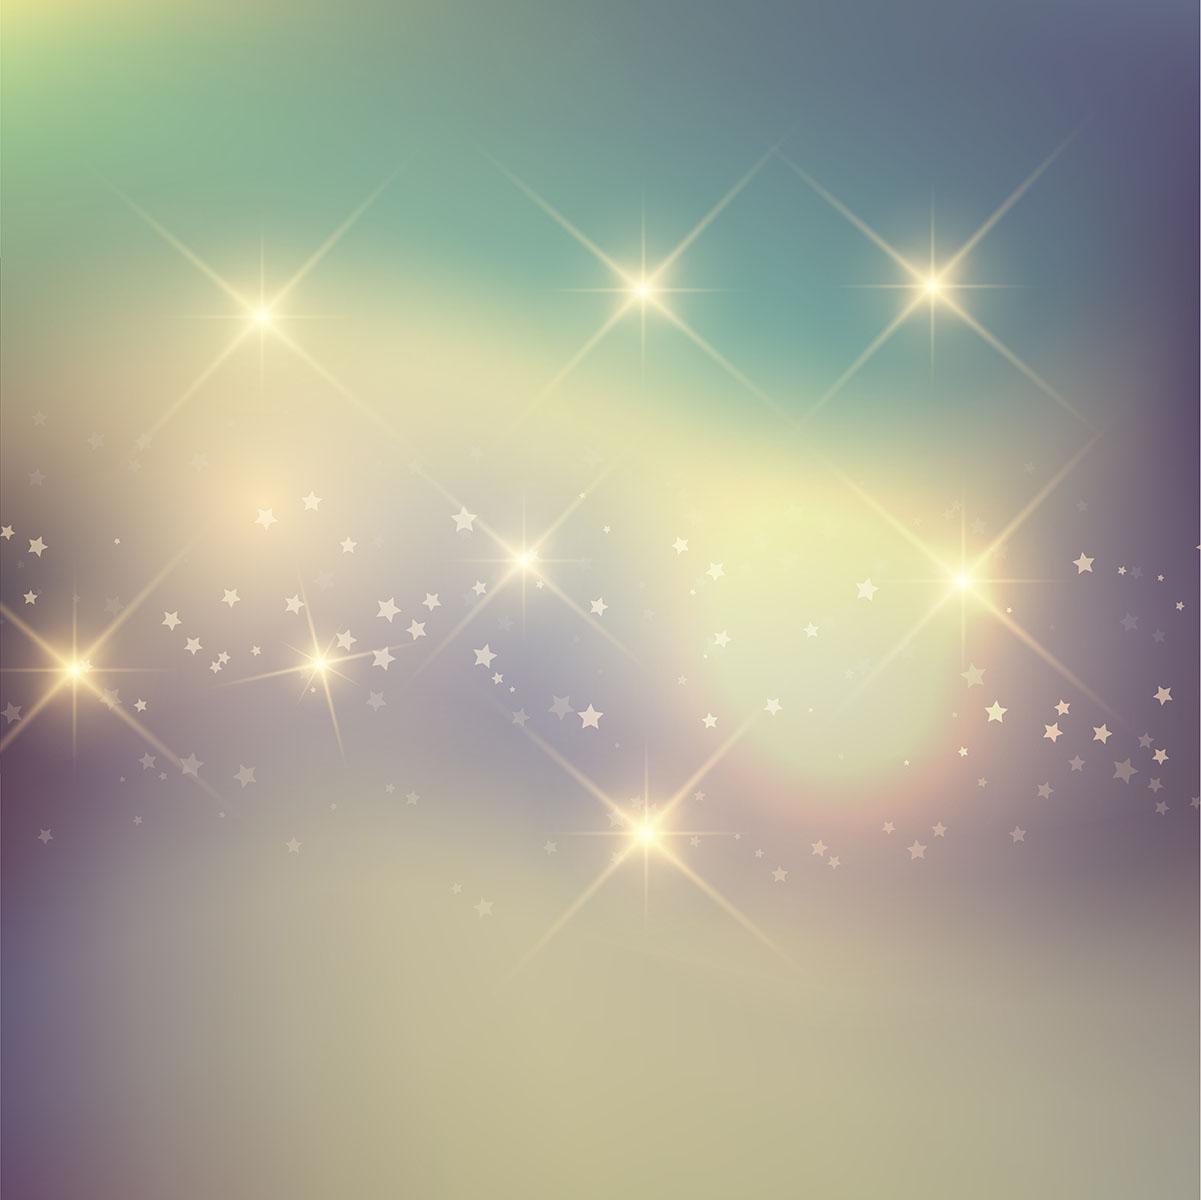 Retro stars background - Download Free Vectors, Clipart ...